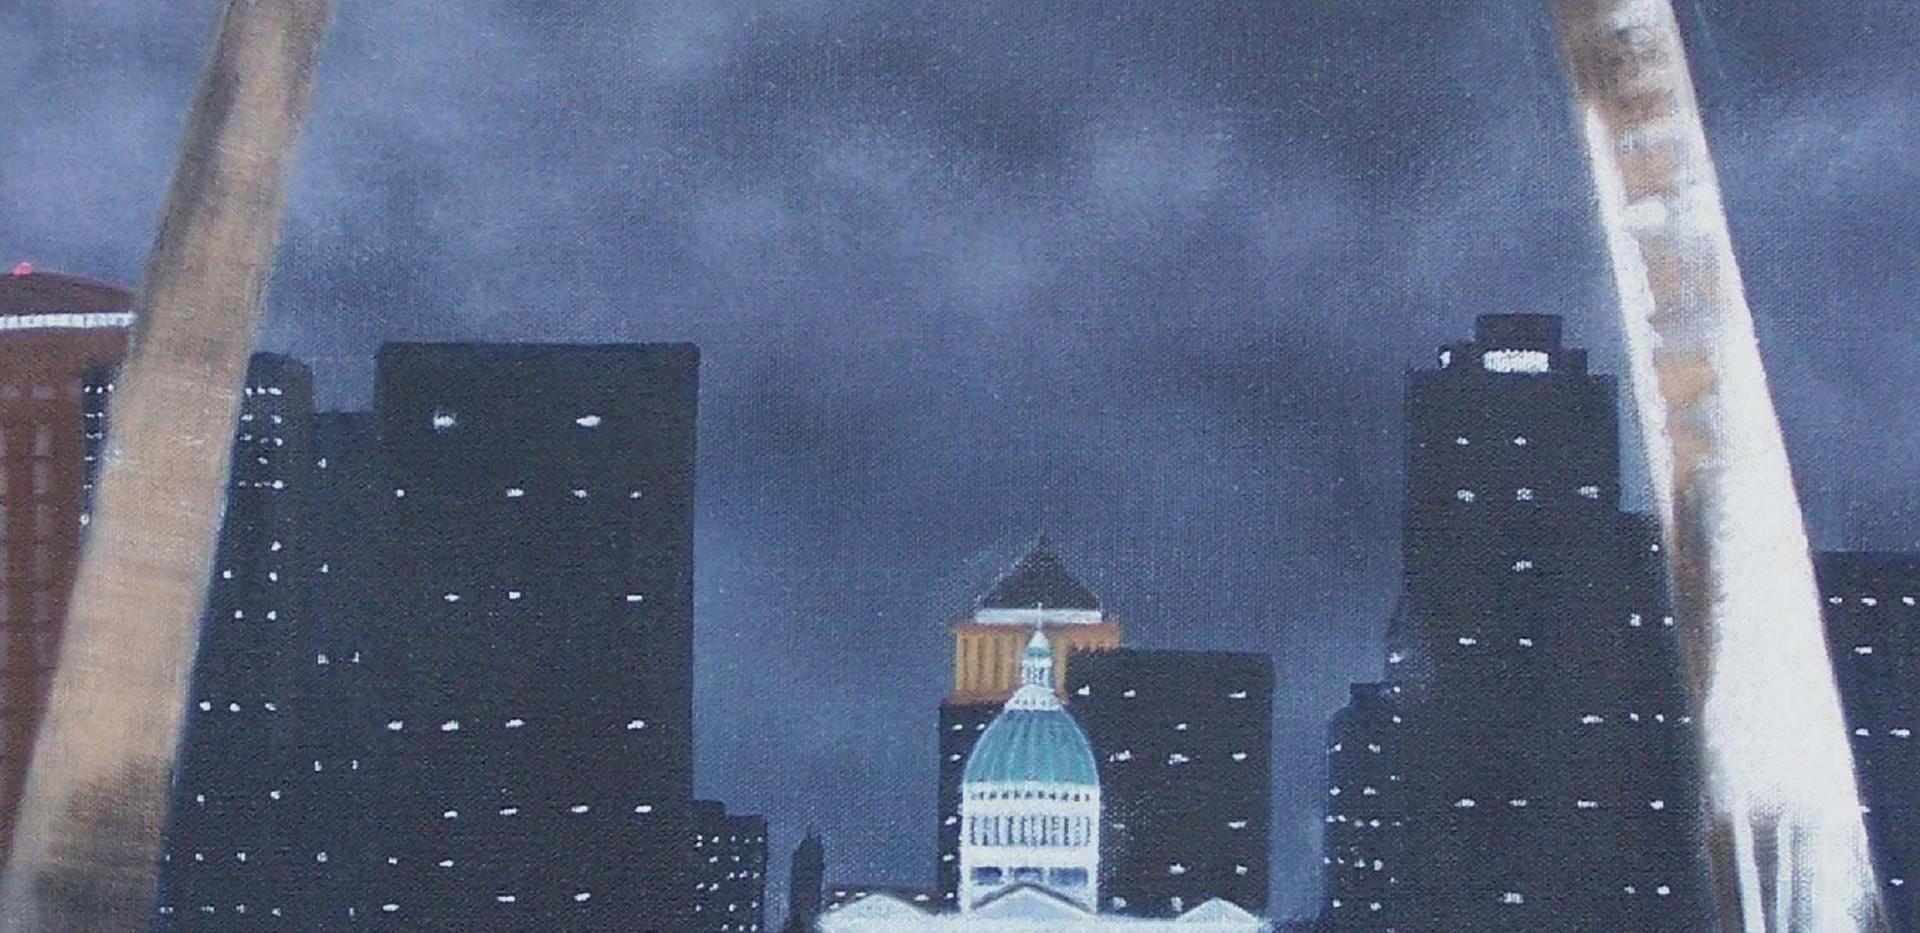 St-LouisS-arch-night-11-x-15.jpg